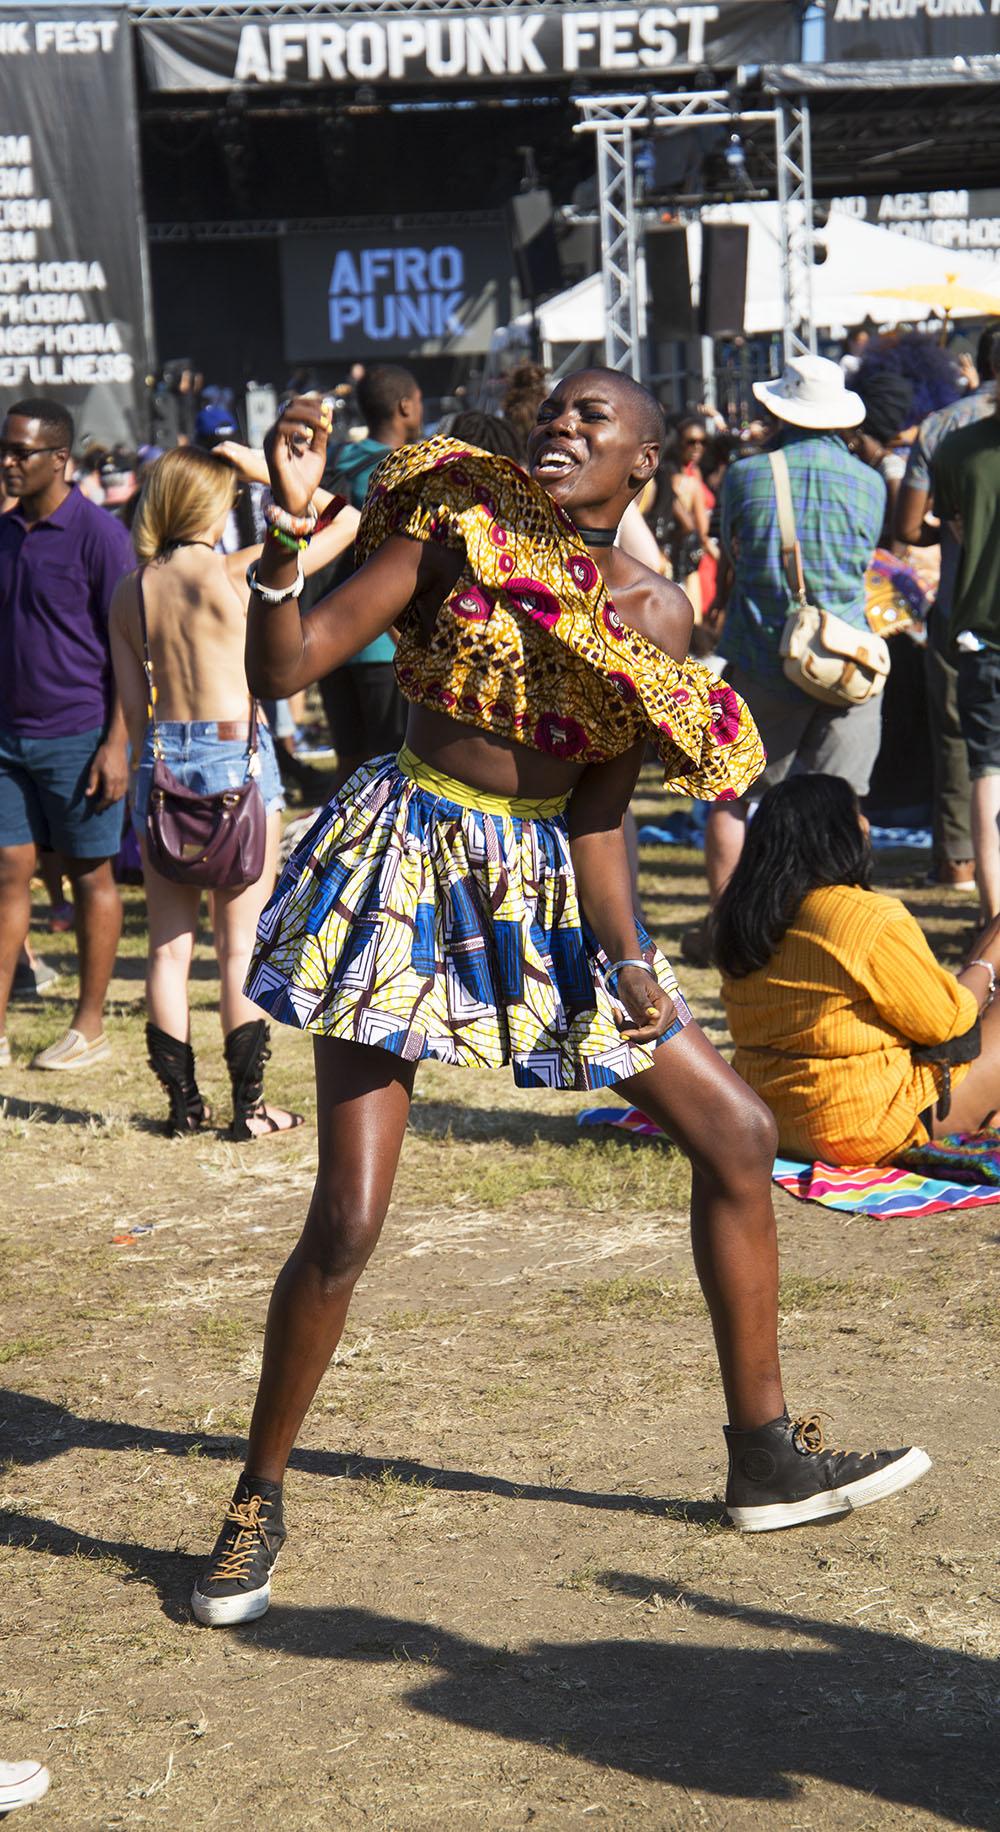 griot-mag-afropunk-_festival-london-paris-new-york-and-new-web-site-johanne-affricot